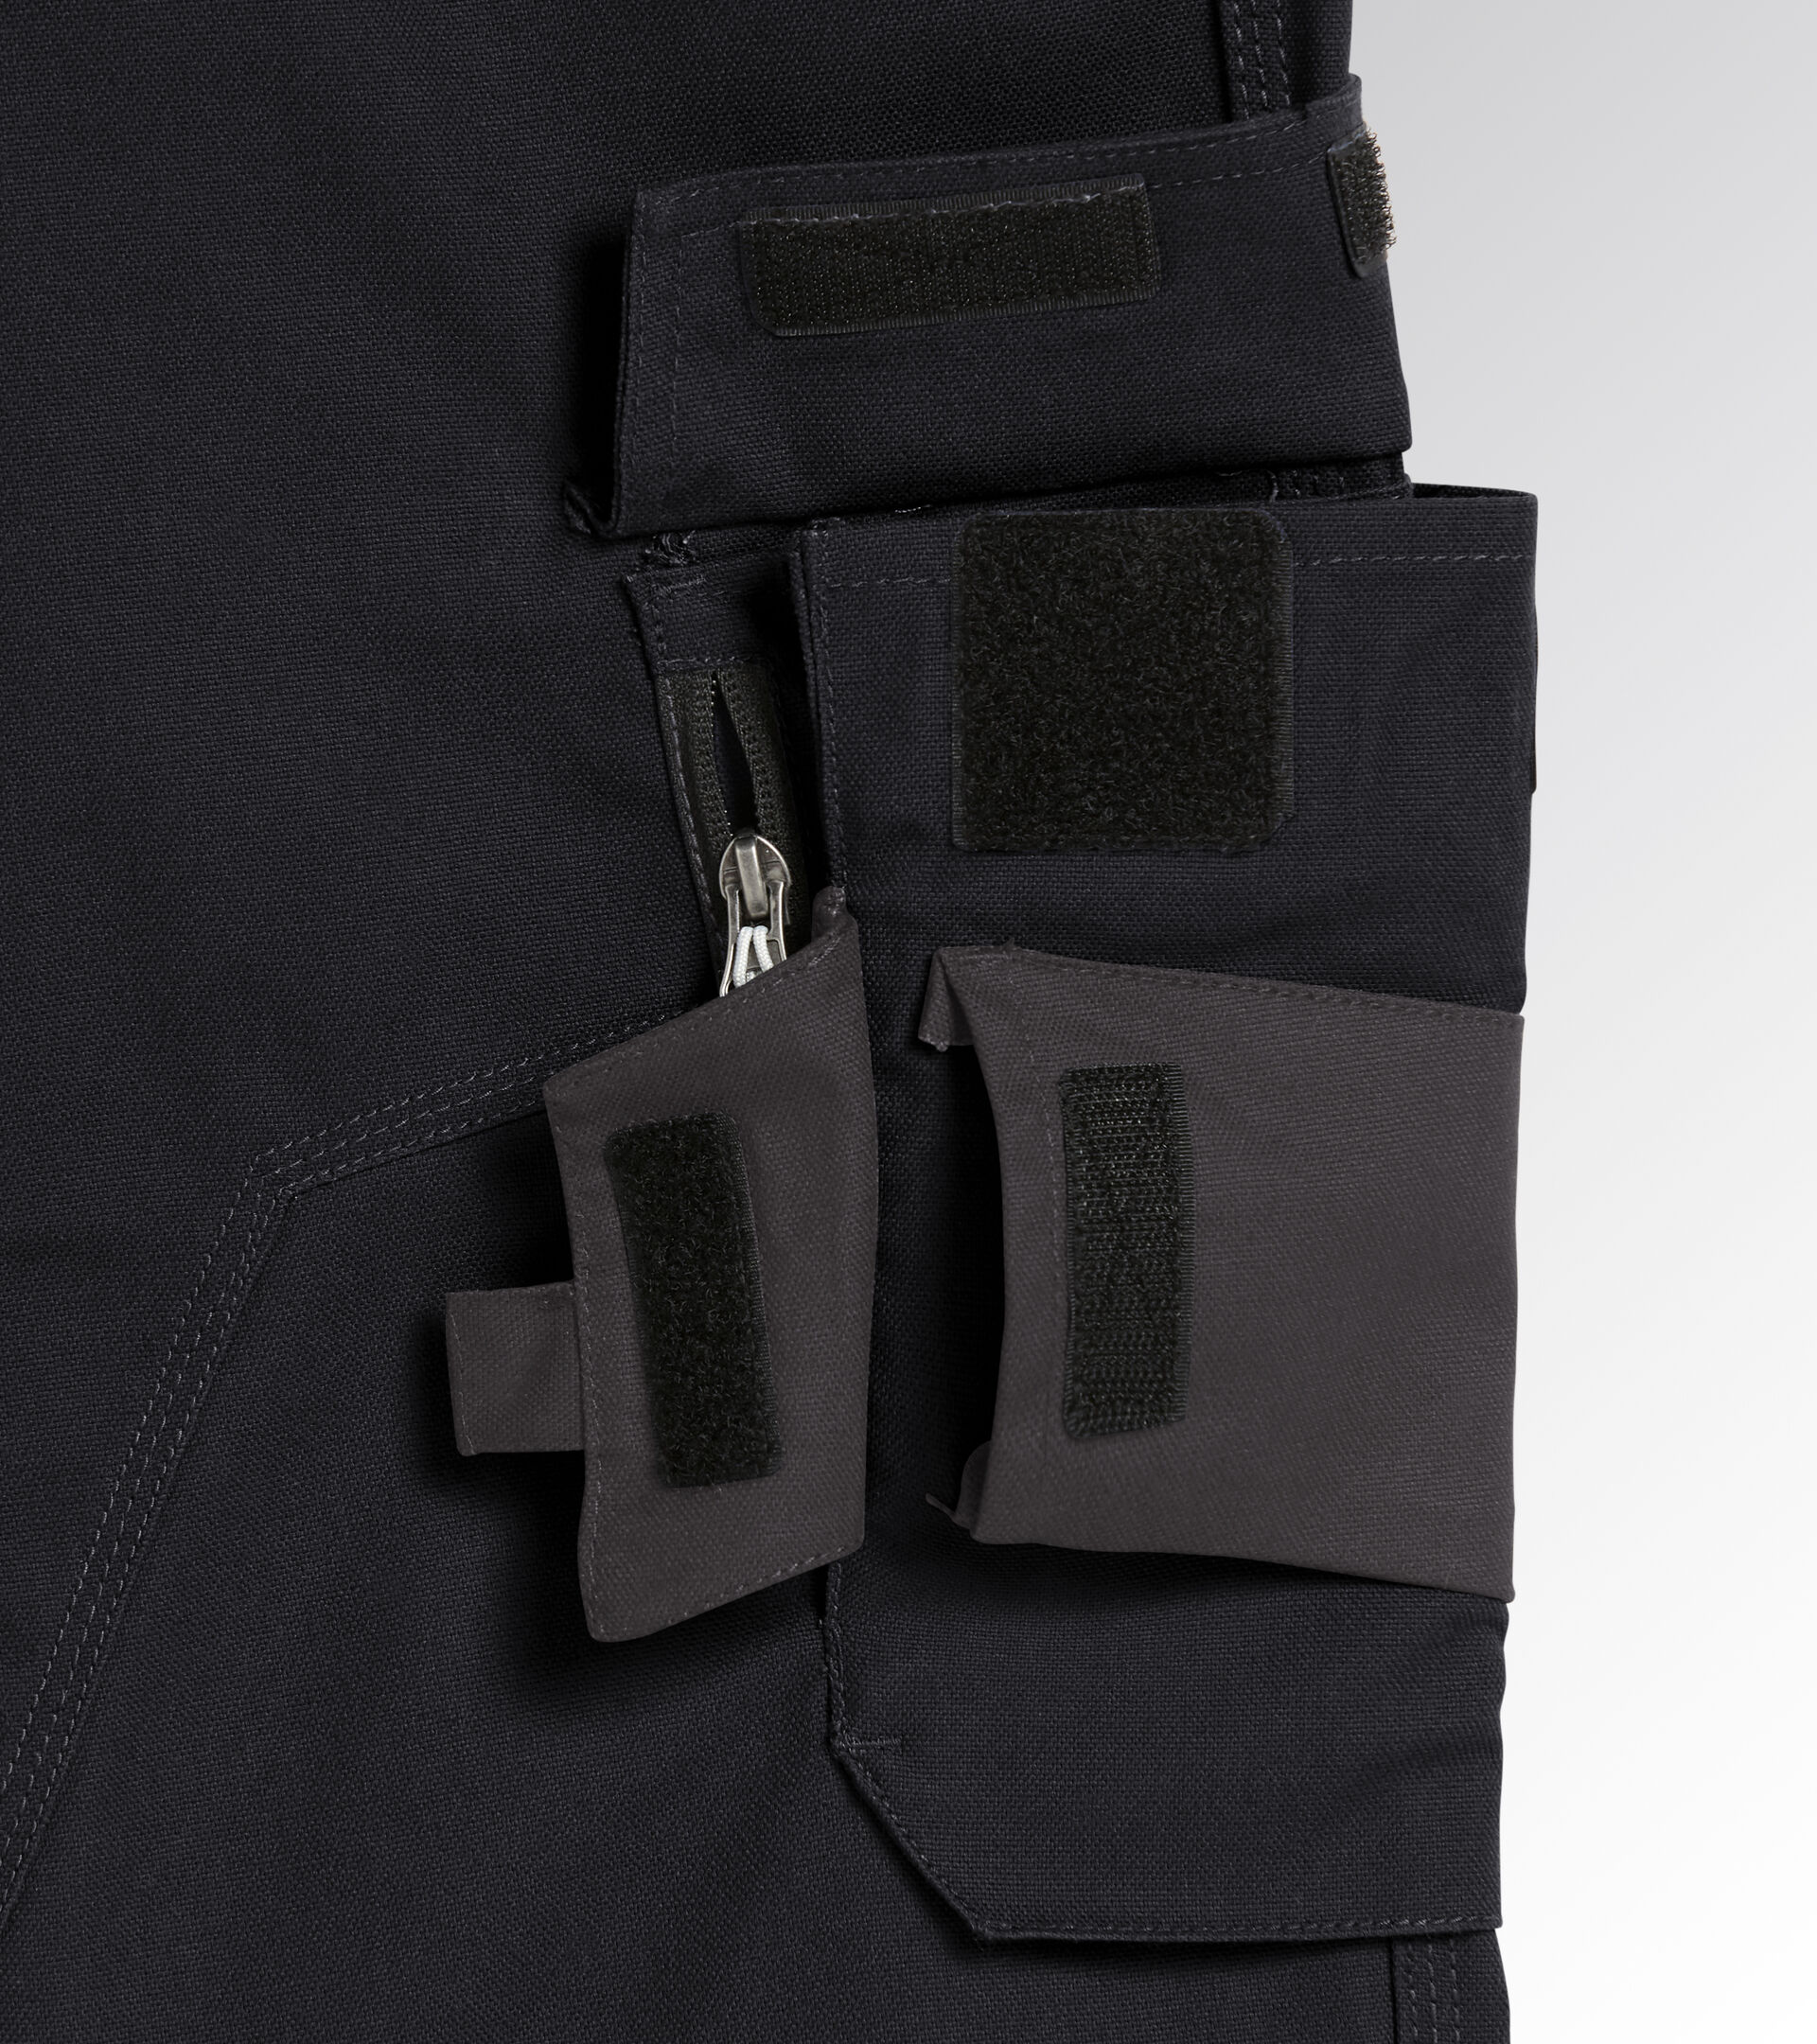 Apparel Utility UOMO PANT TOP PERFORMANCE BLACK Utility